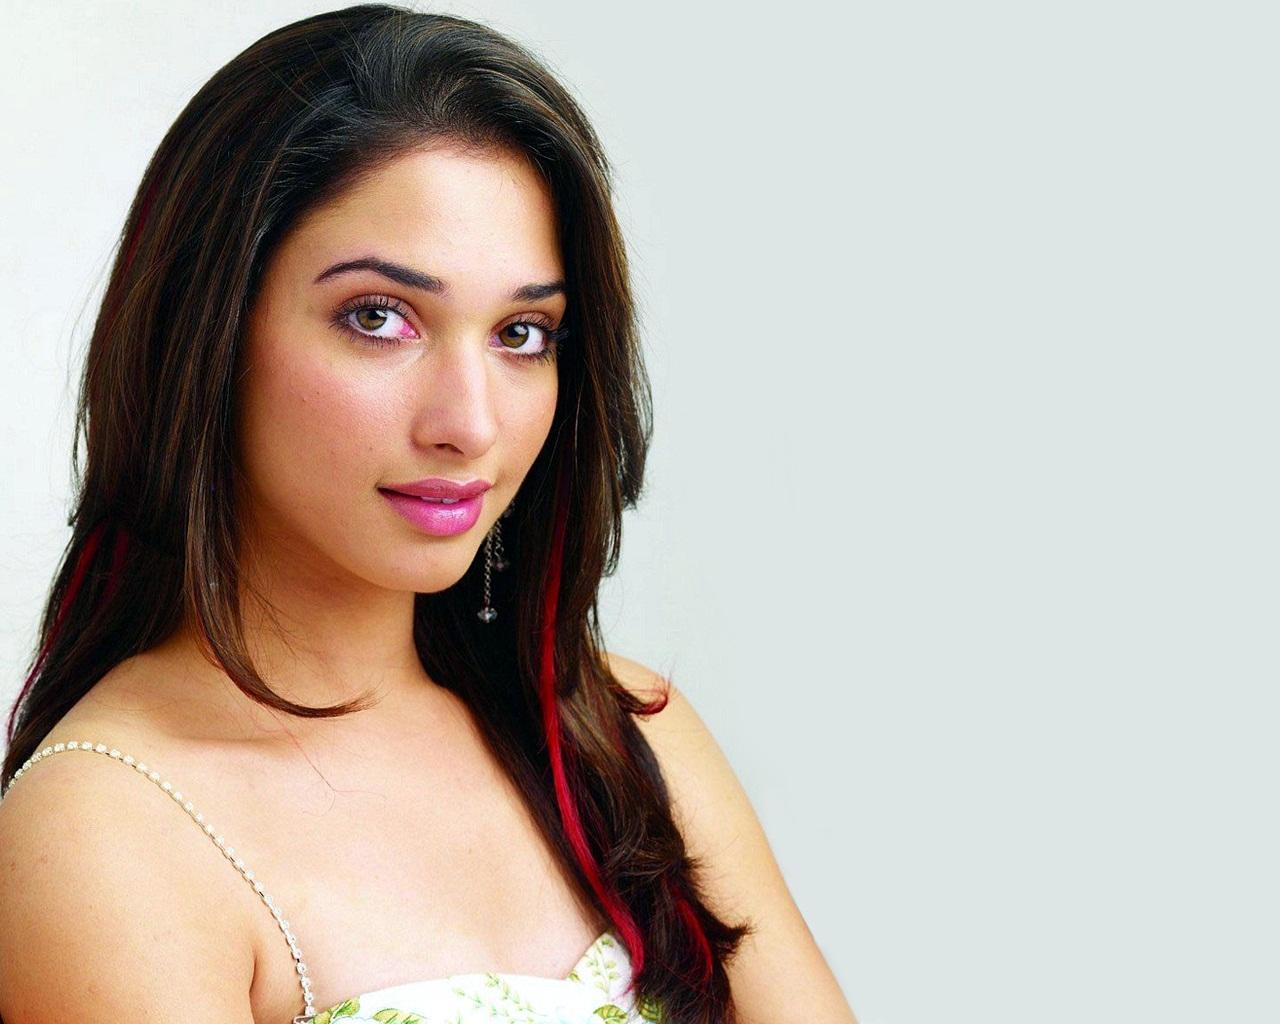 Tamanna South Actress Wallpapers HD Wallpapers 1280x1024